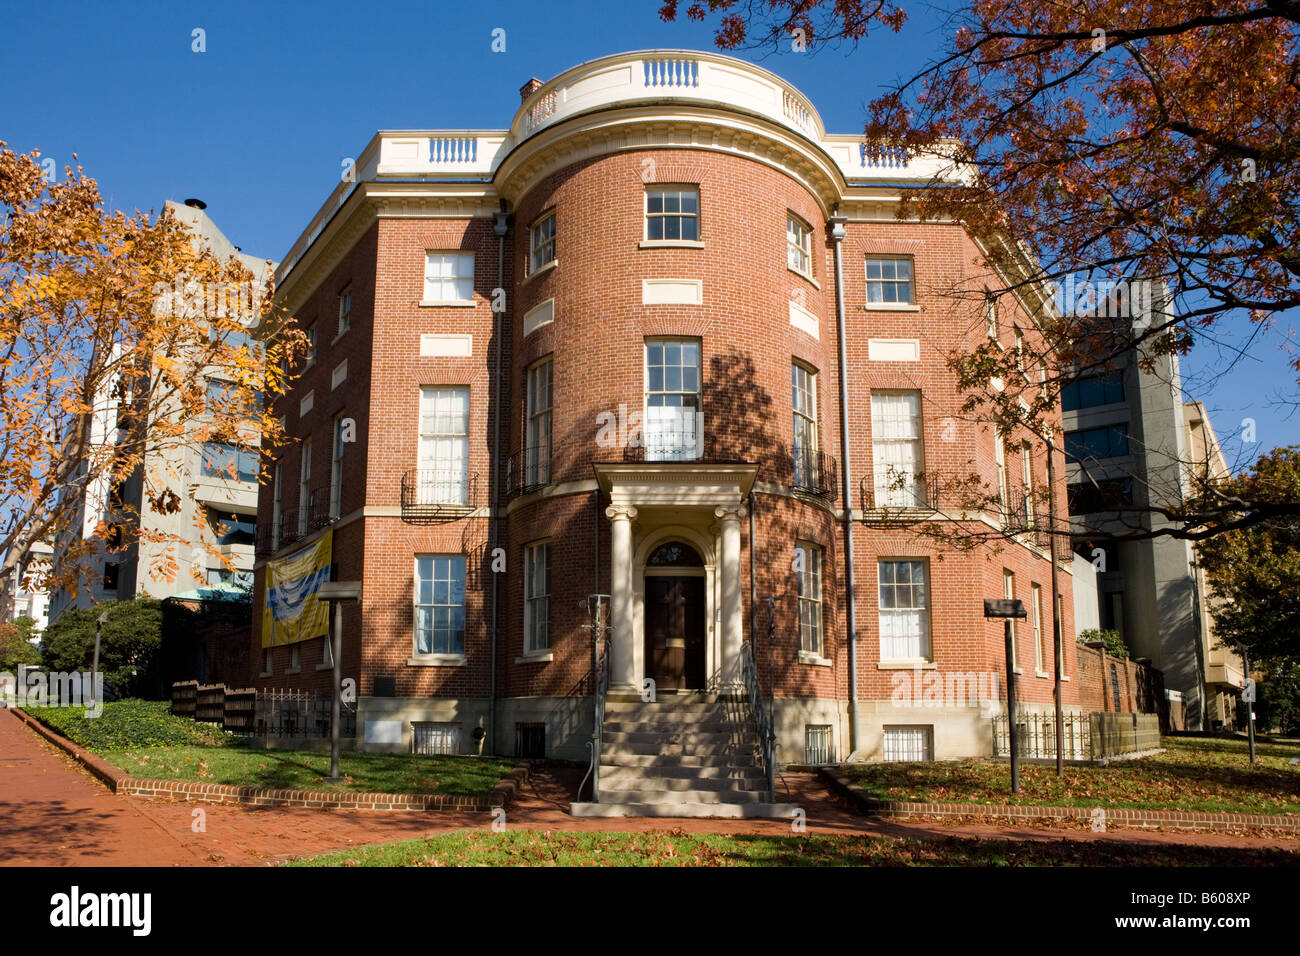 Octagon House was home to President Madison Washington D.C. - Stock Image